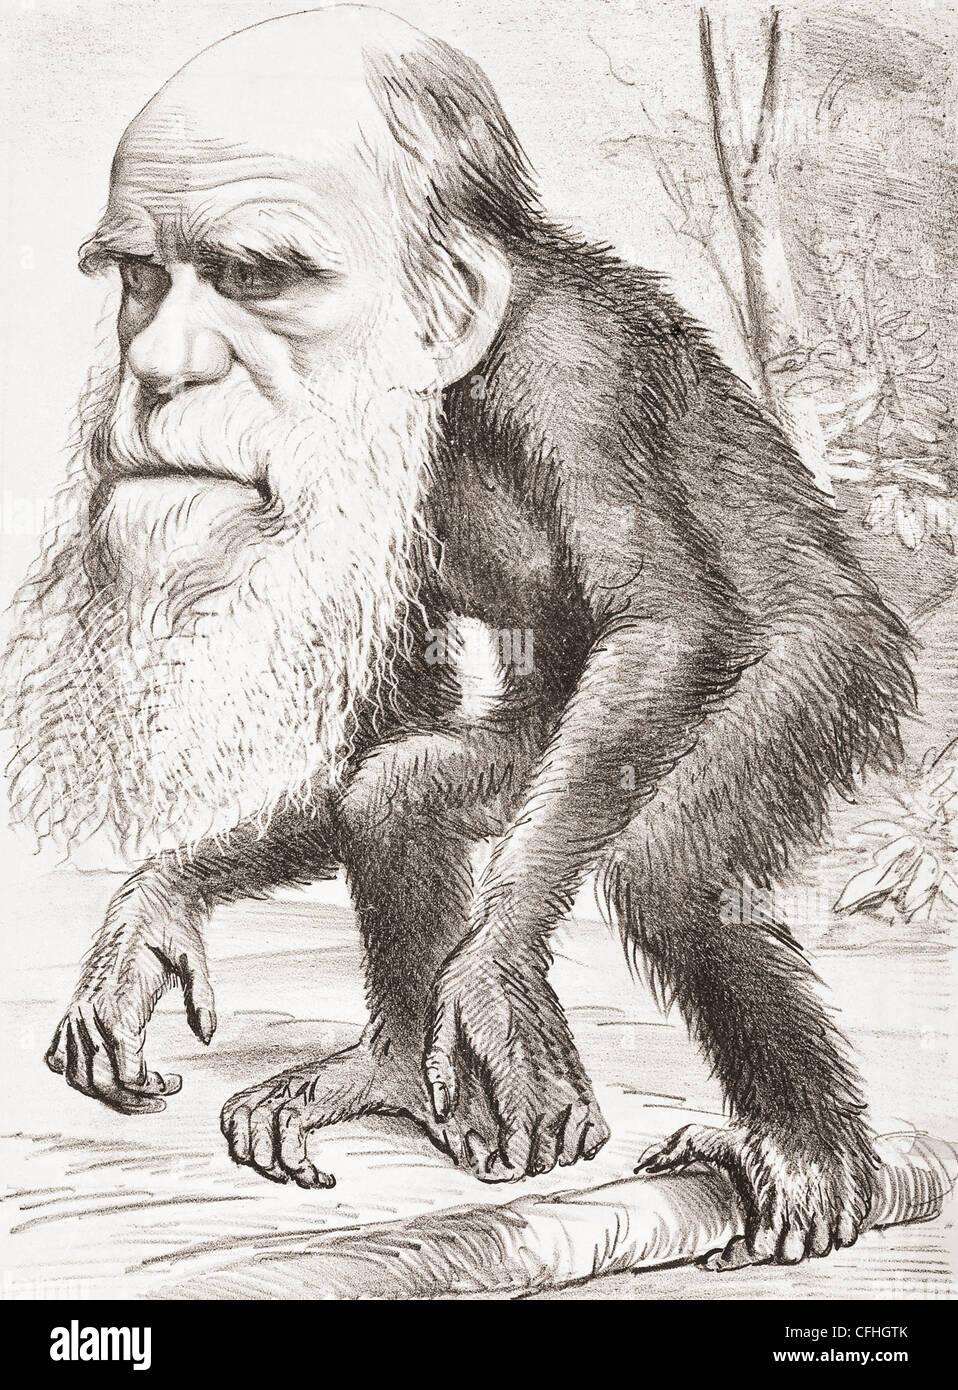 Charles darwin 1809 1882. naturalista inglese qui raffigurato come